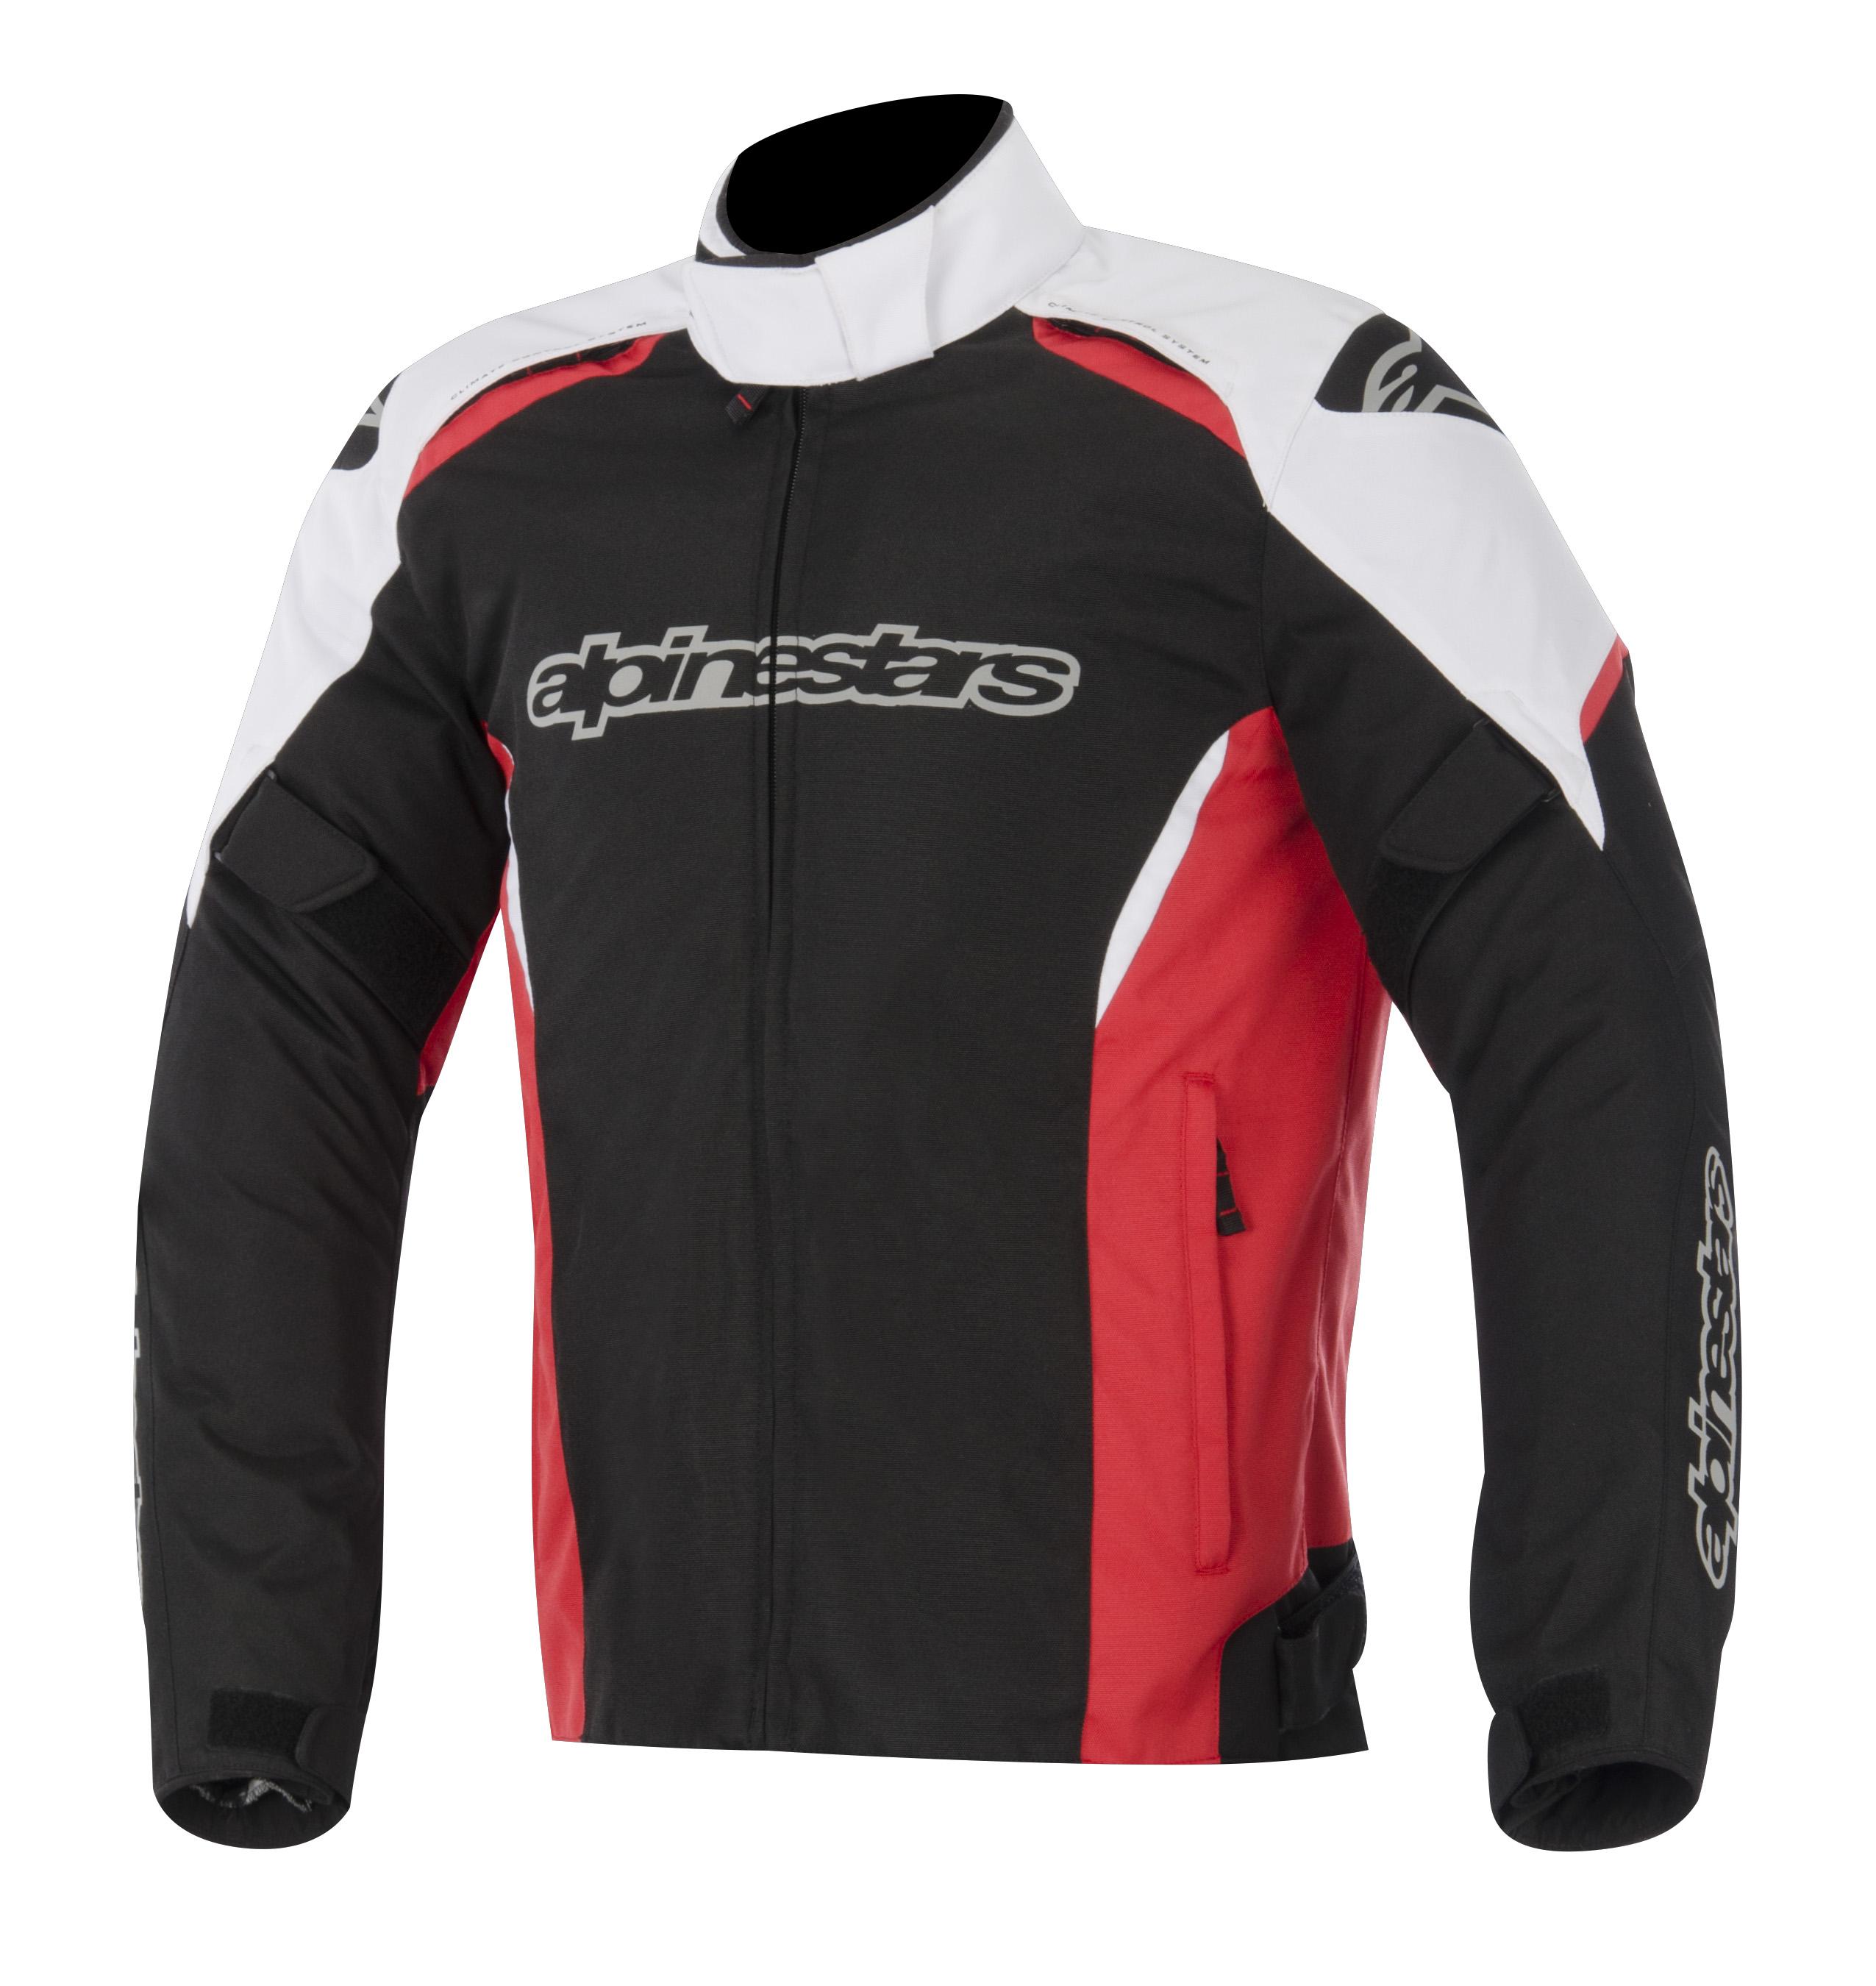 Alpinestars Gunner Mens Waterproof Jacket Black/White/Red